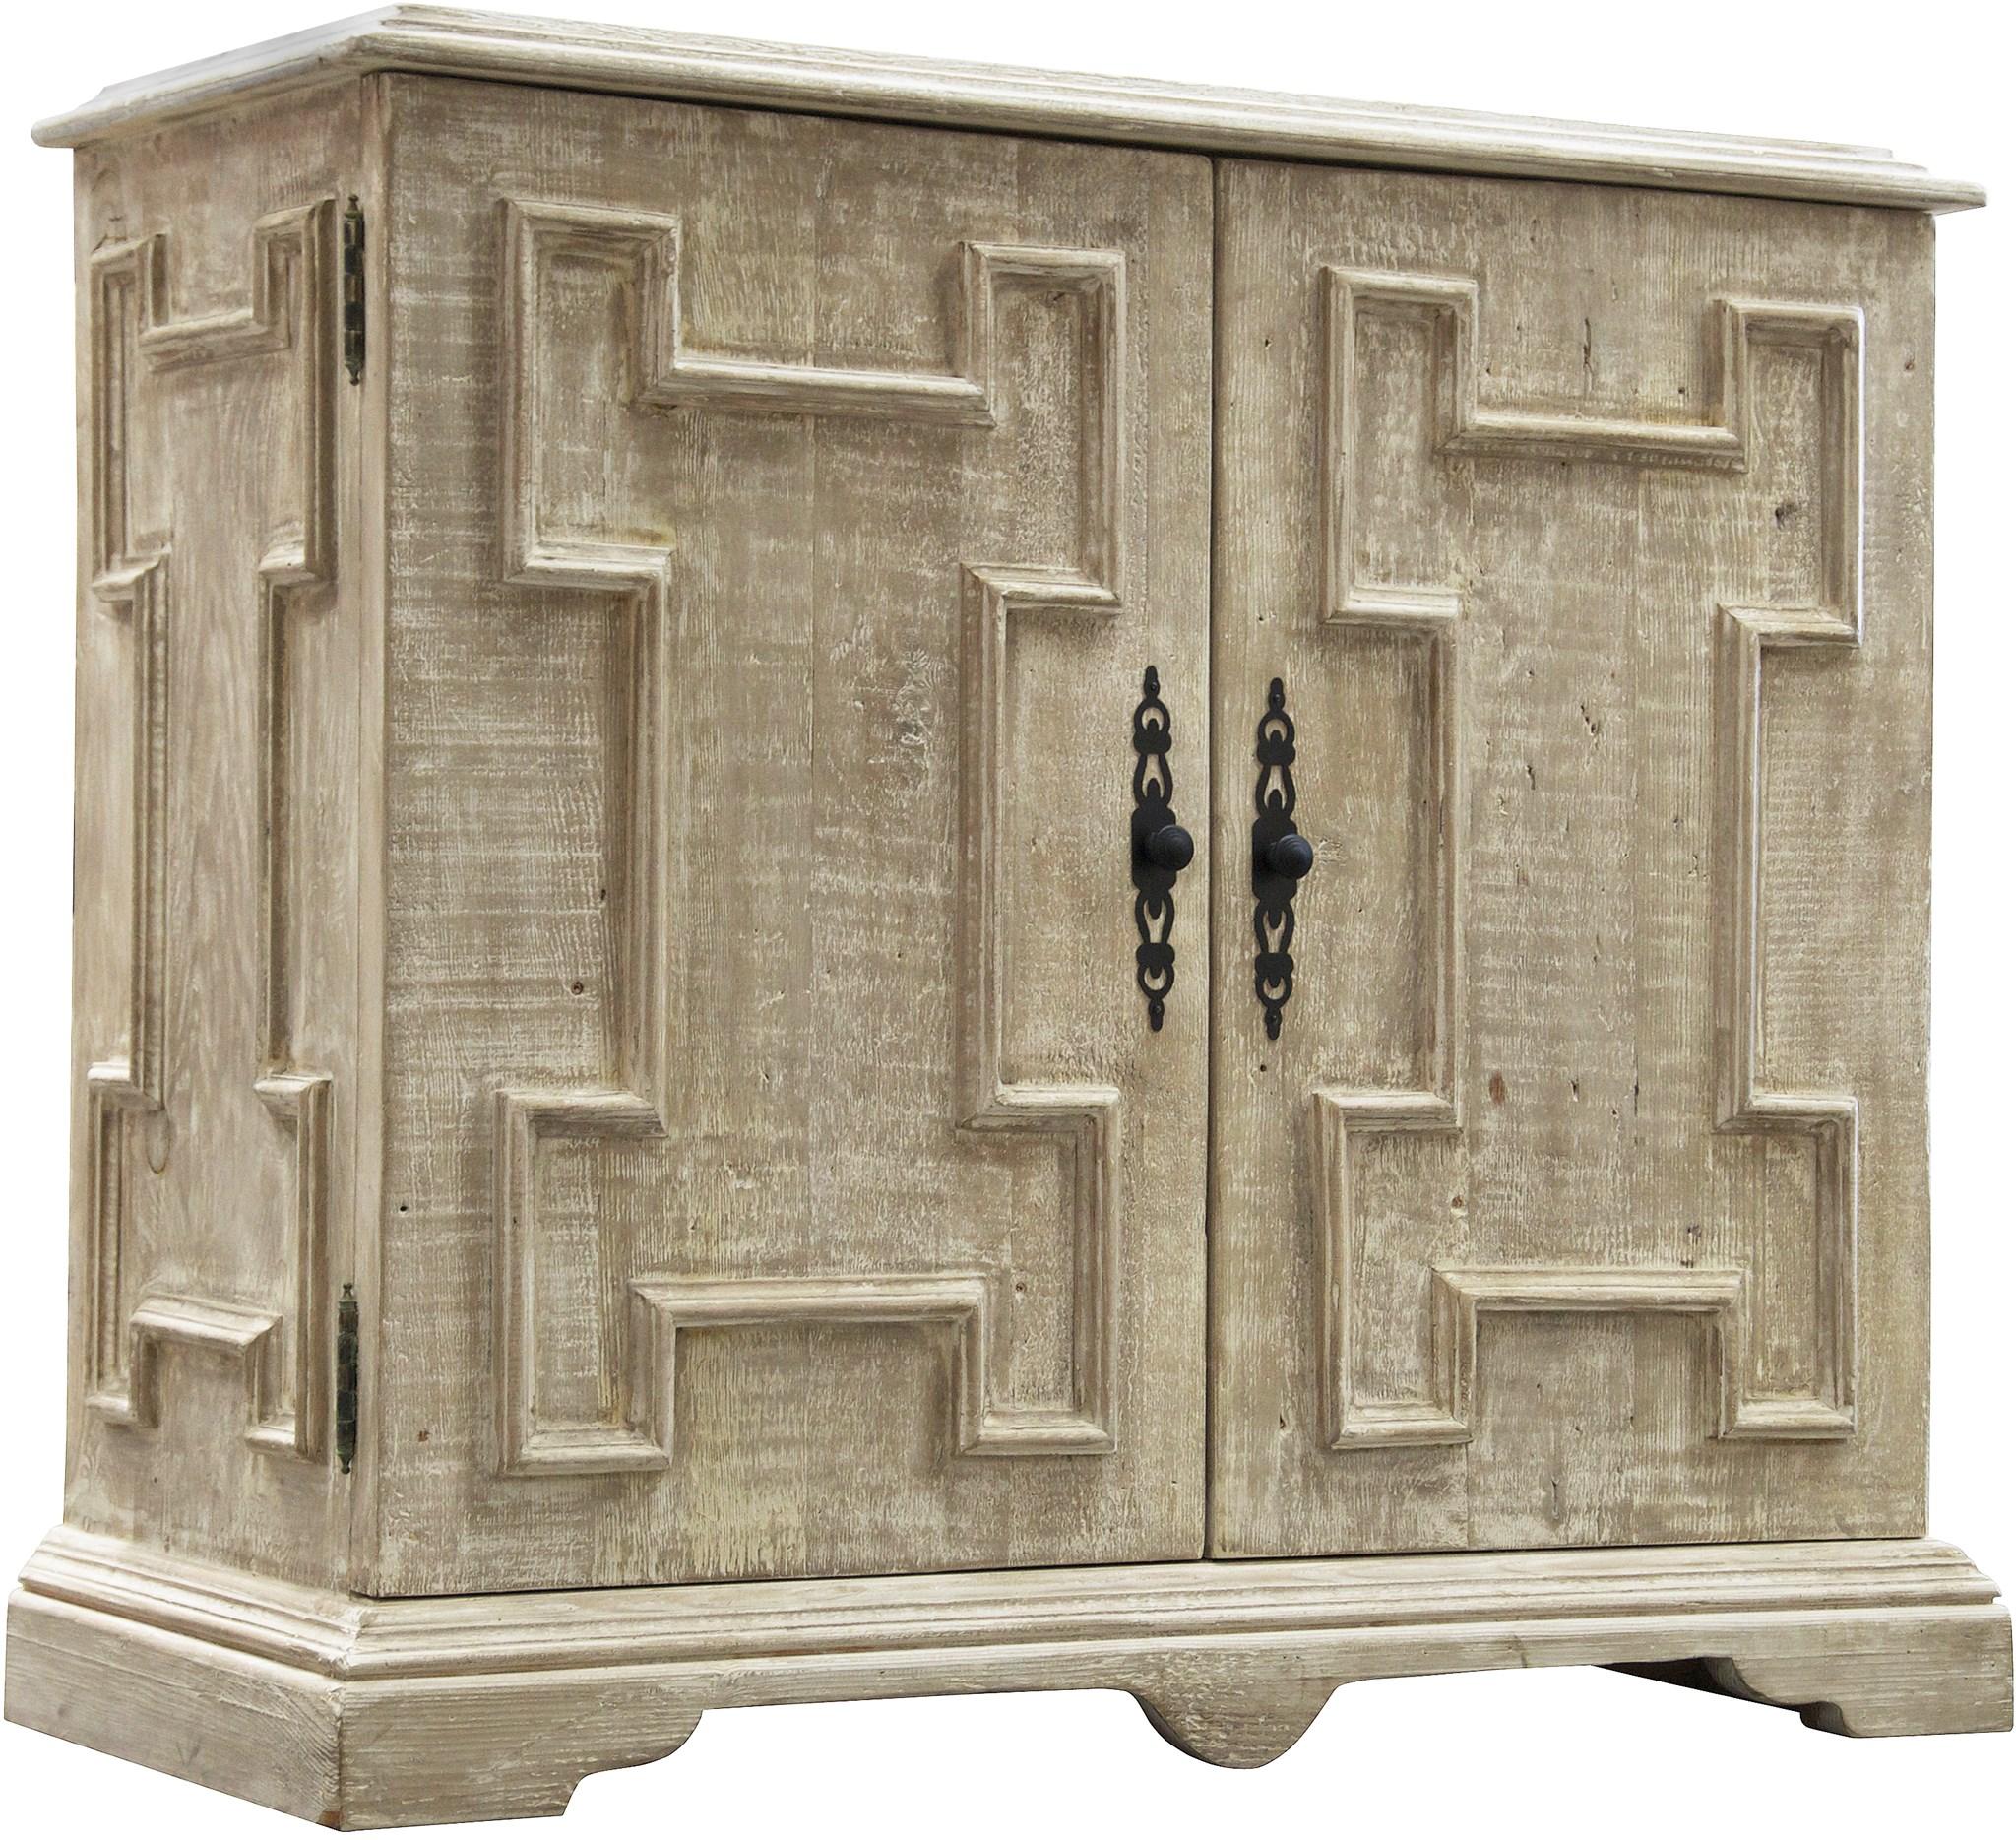 Superbe Reclaimed Lumber Gothic Cabinet